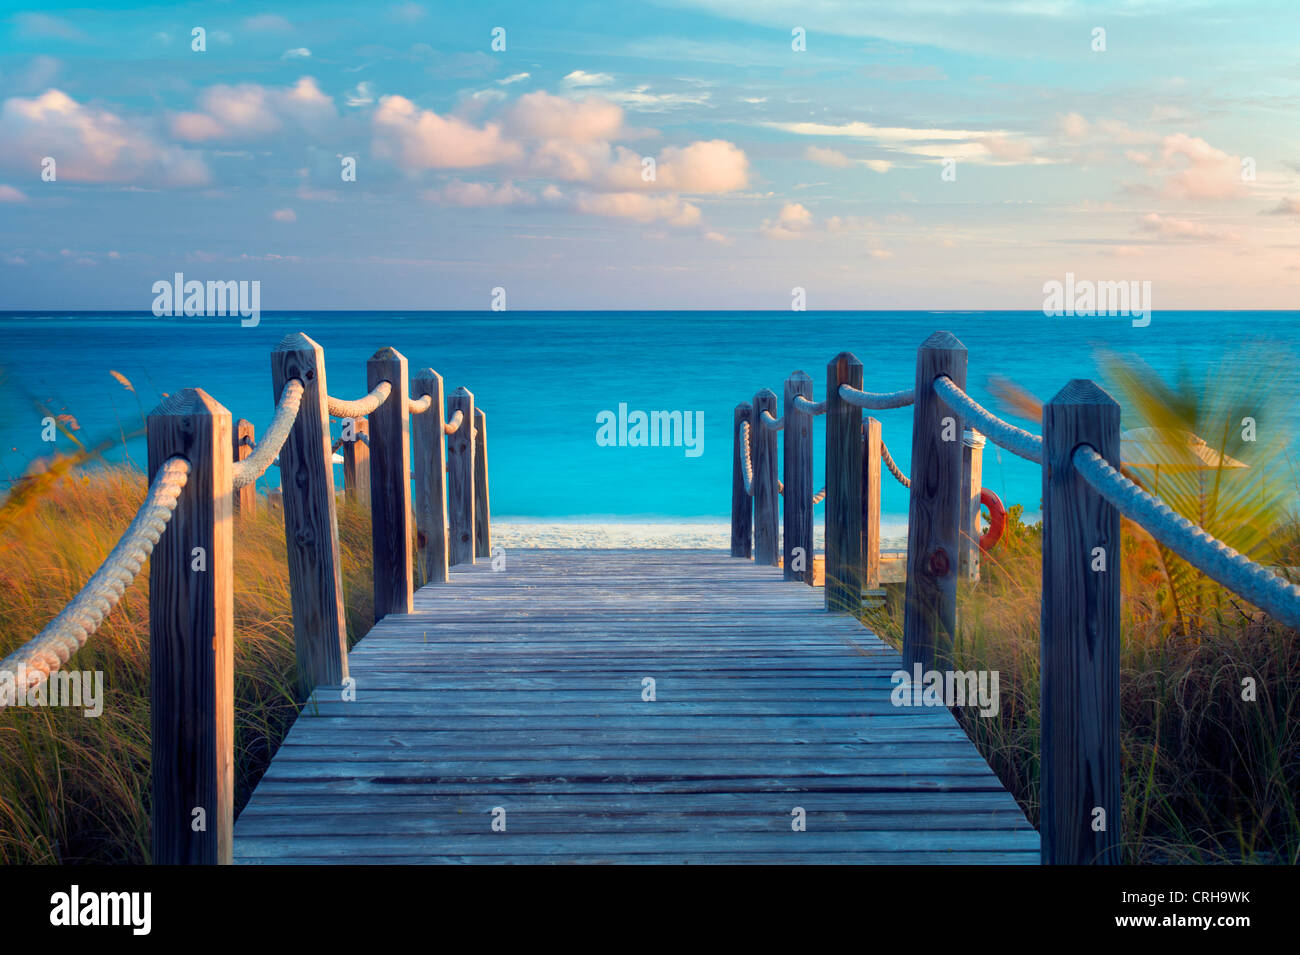 Board Weg zum Ozean. Grace Bay in Providenciales. Turks- und Caicosinseln. Stockbild